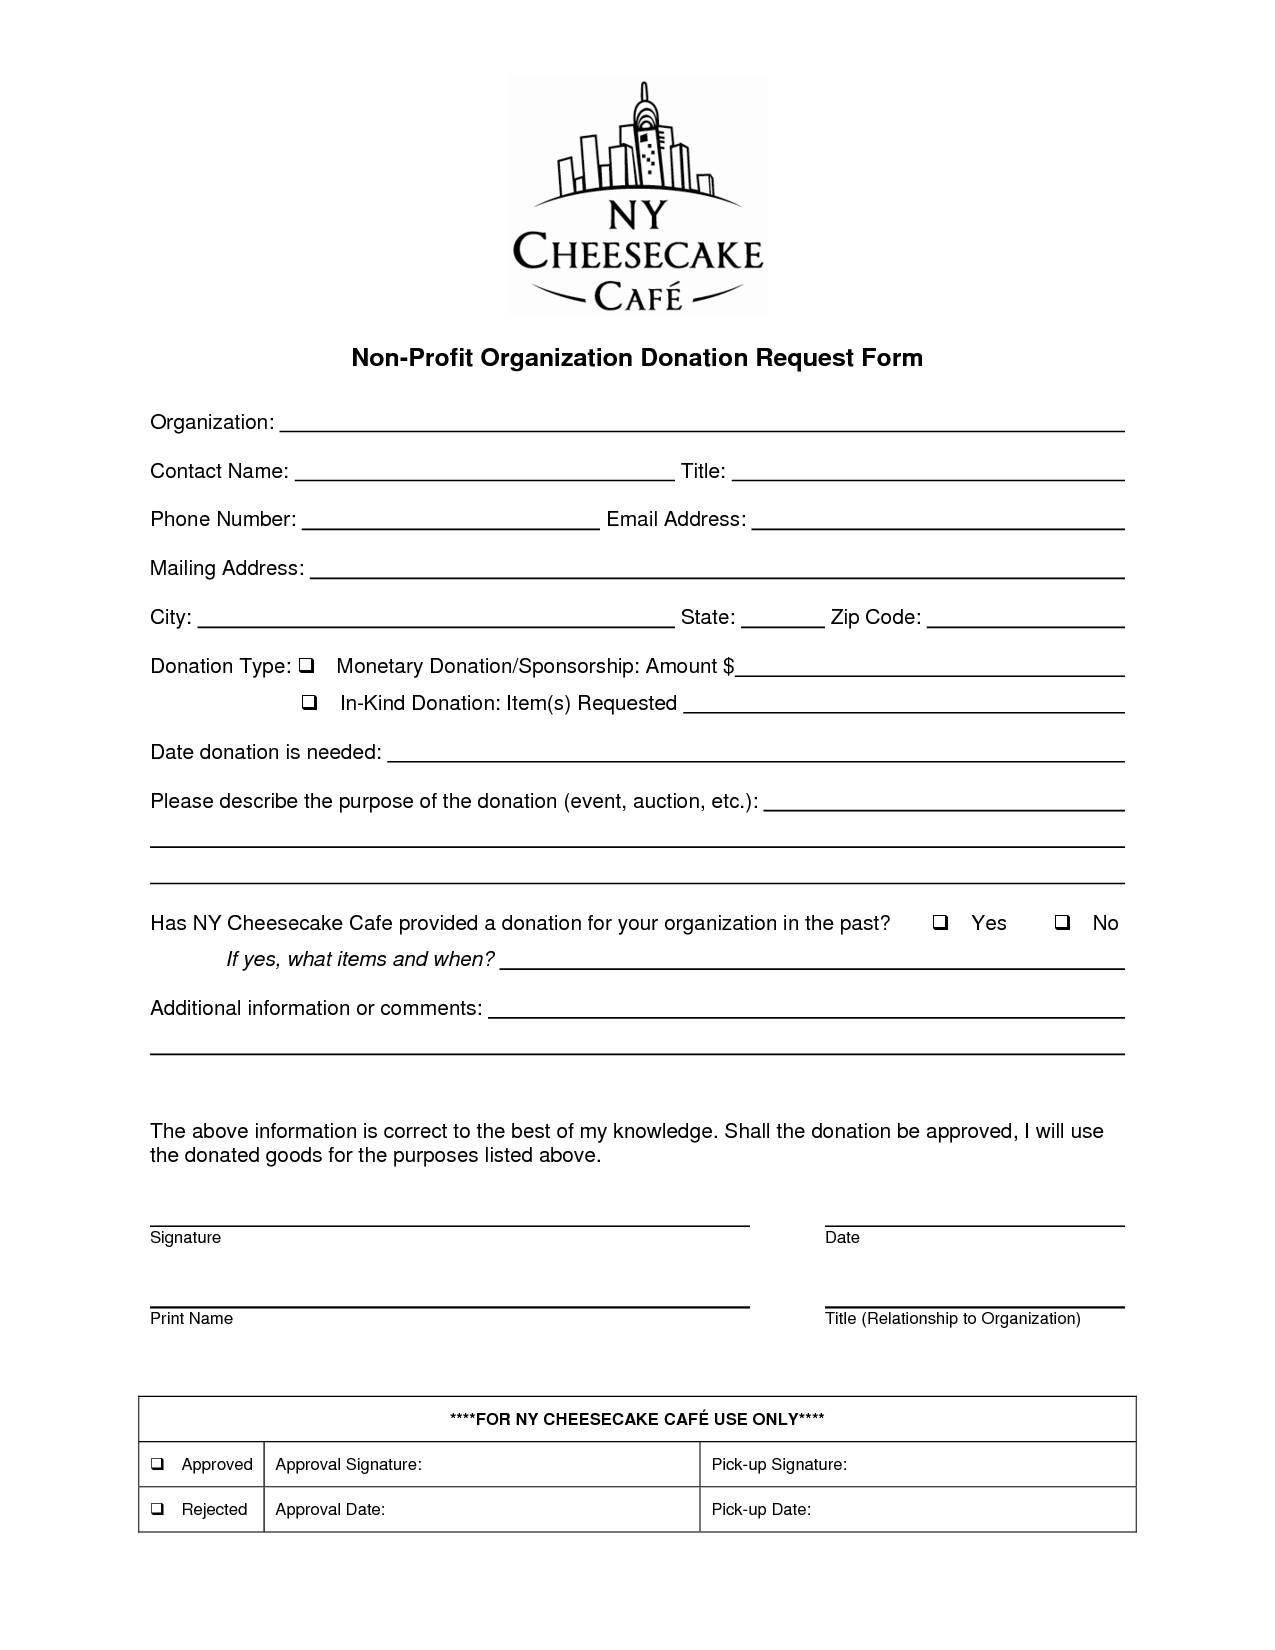 Non Profit Donation Request Form Template